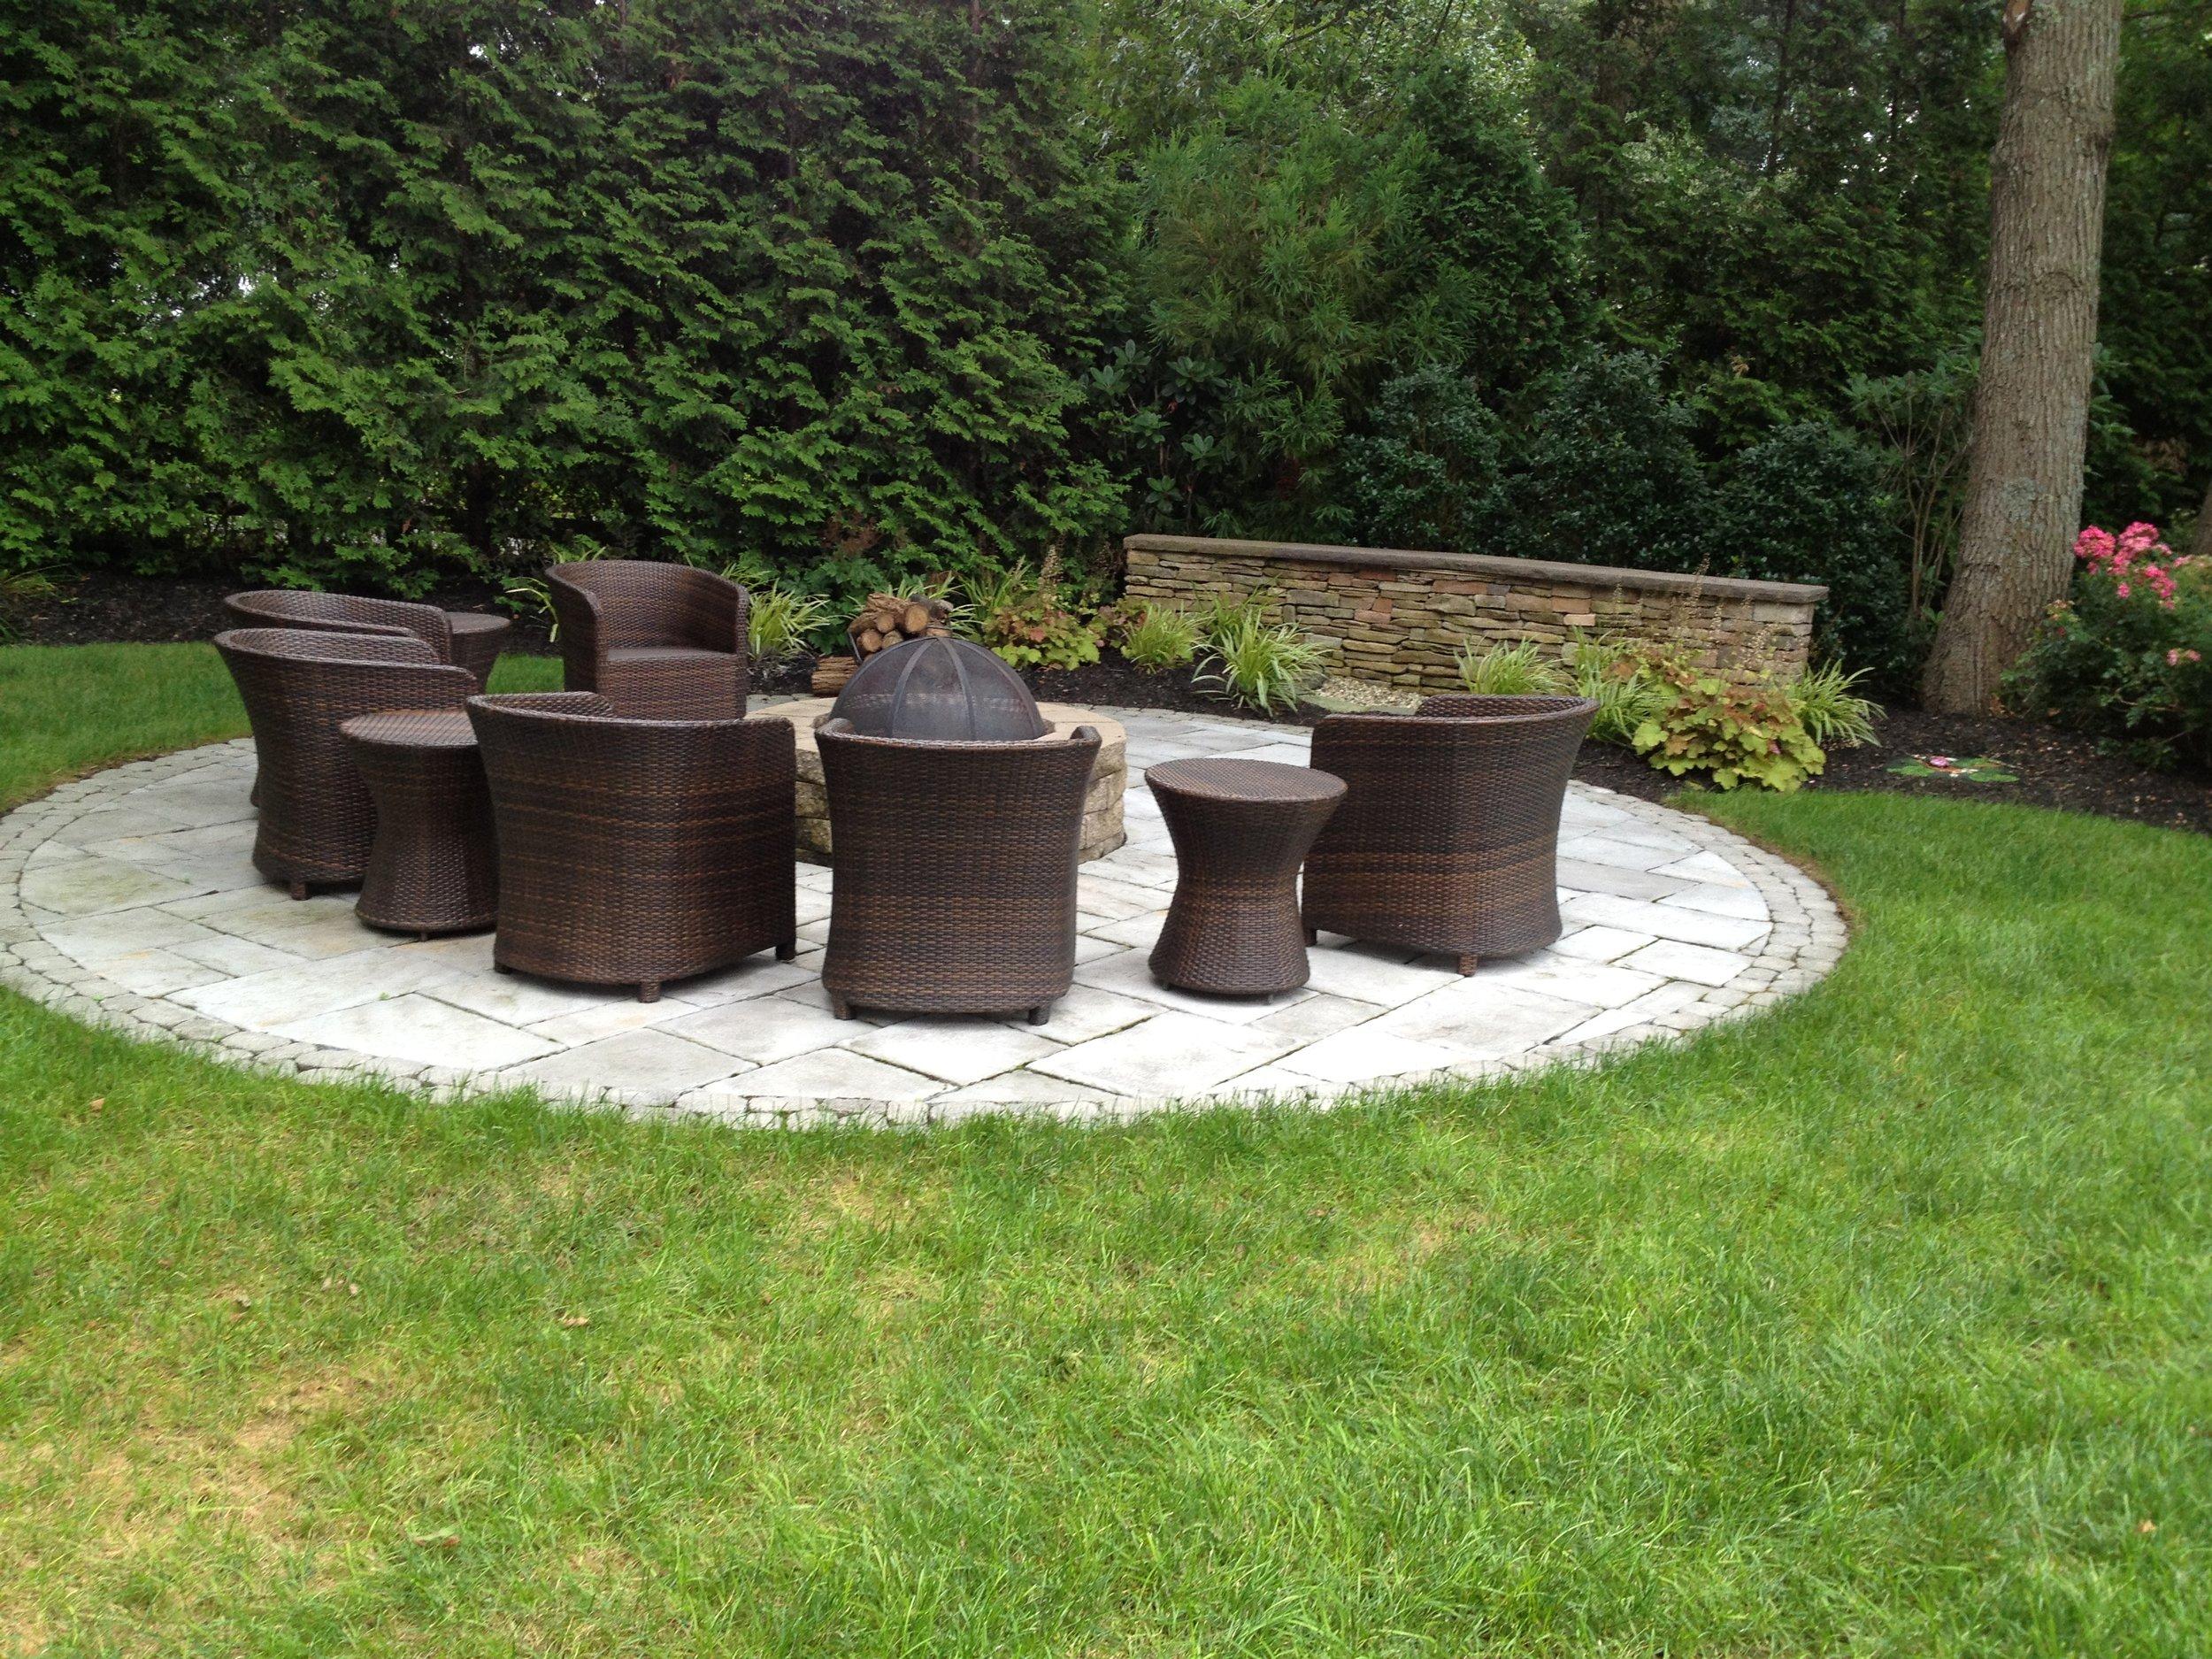 Professional patio paver design company in Long Island, NY